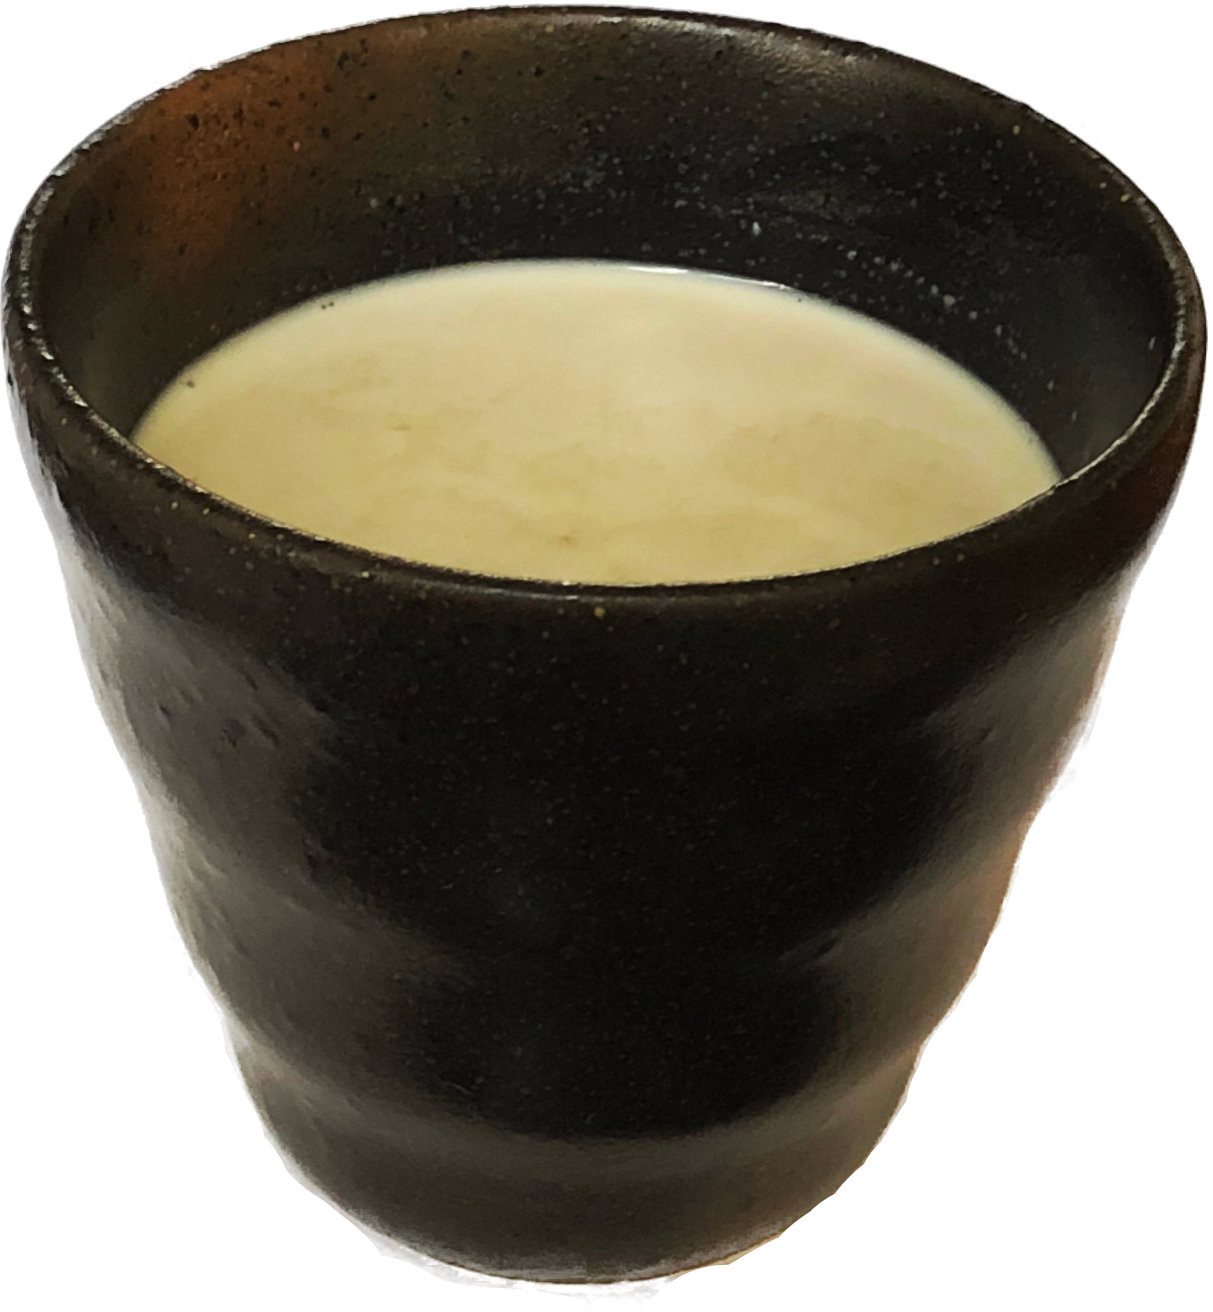 Hojicha Green Tea Powder